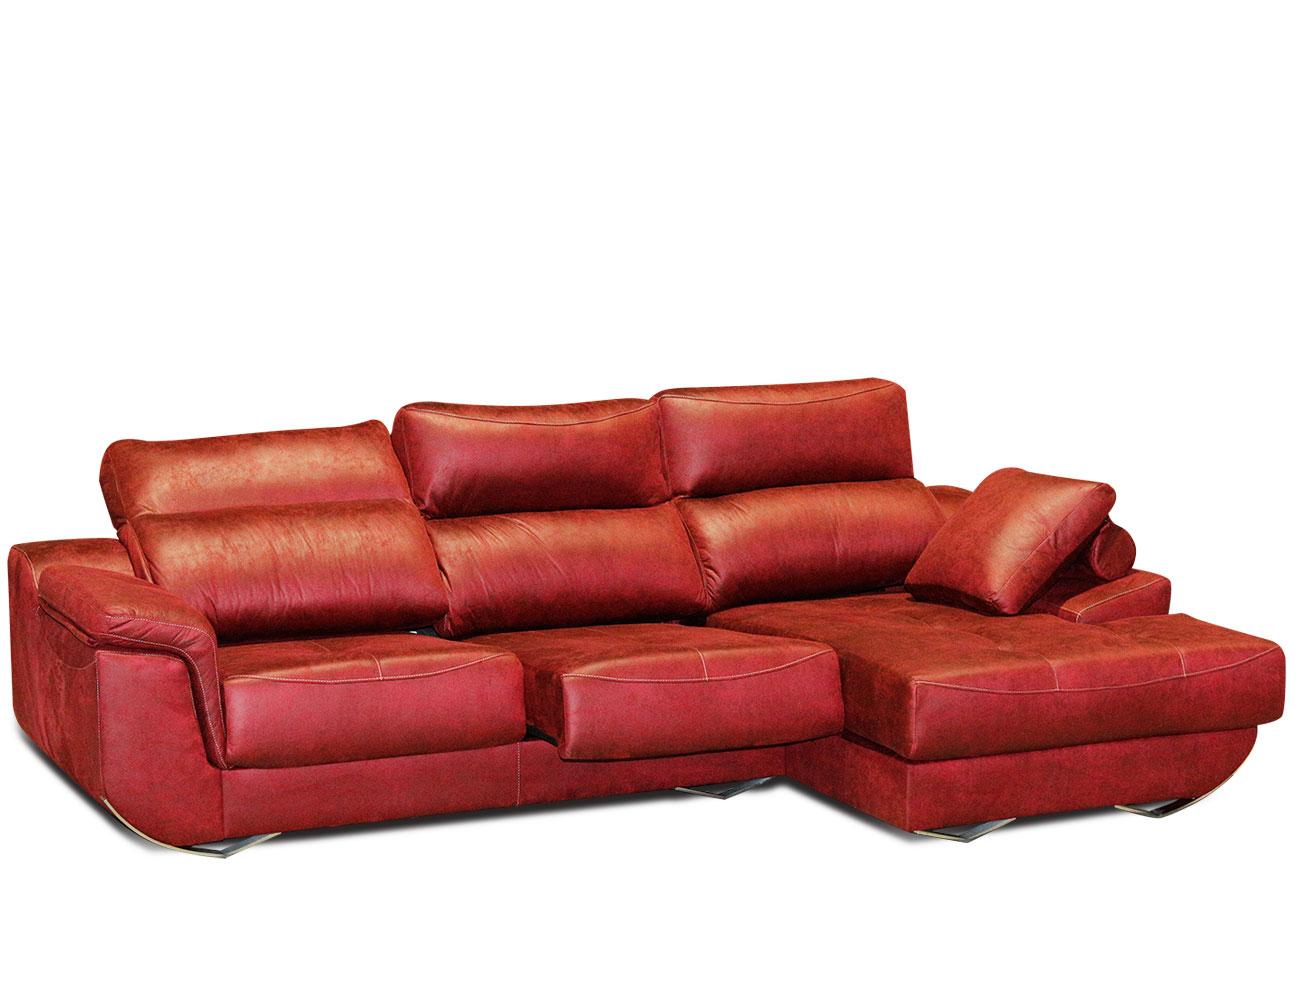 Sofa chaiselongue rojo granate moderno